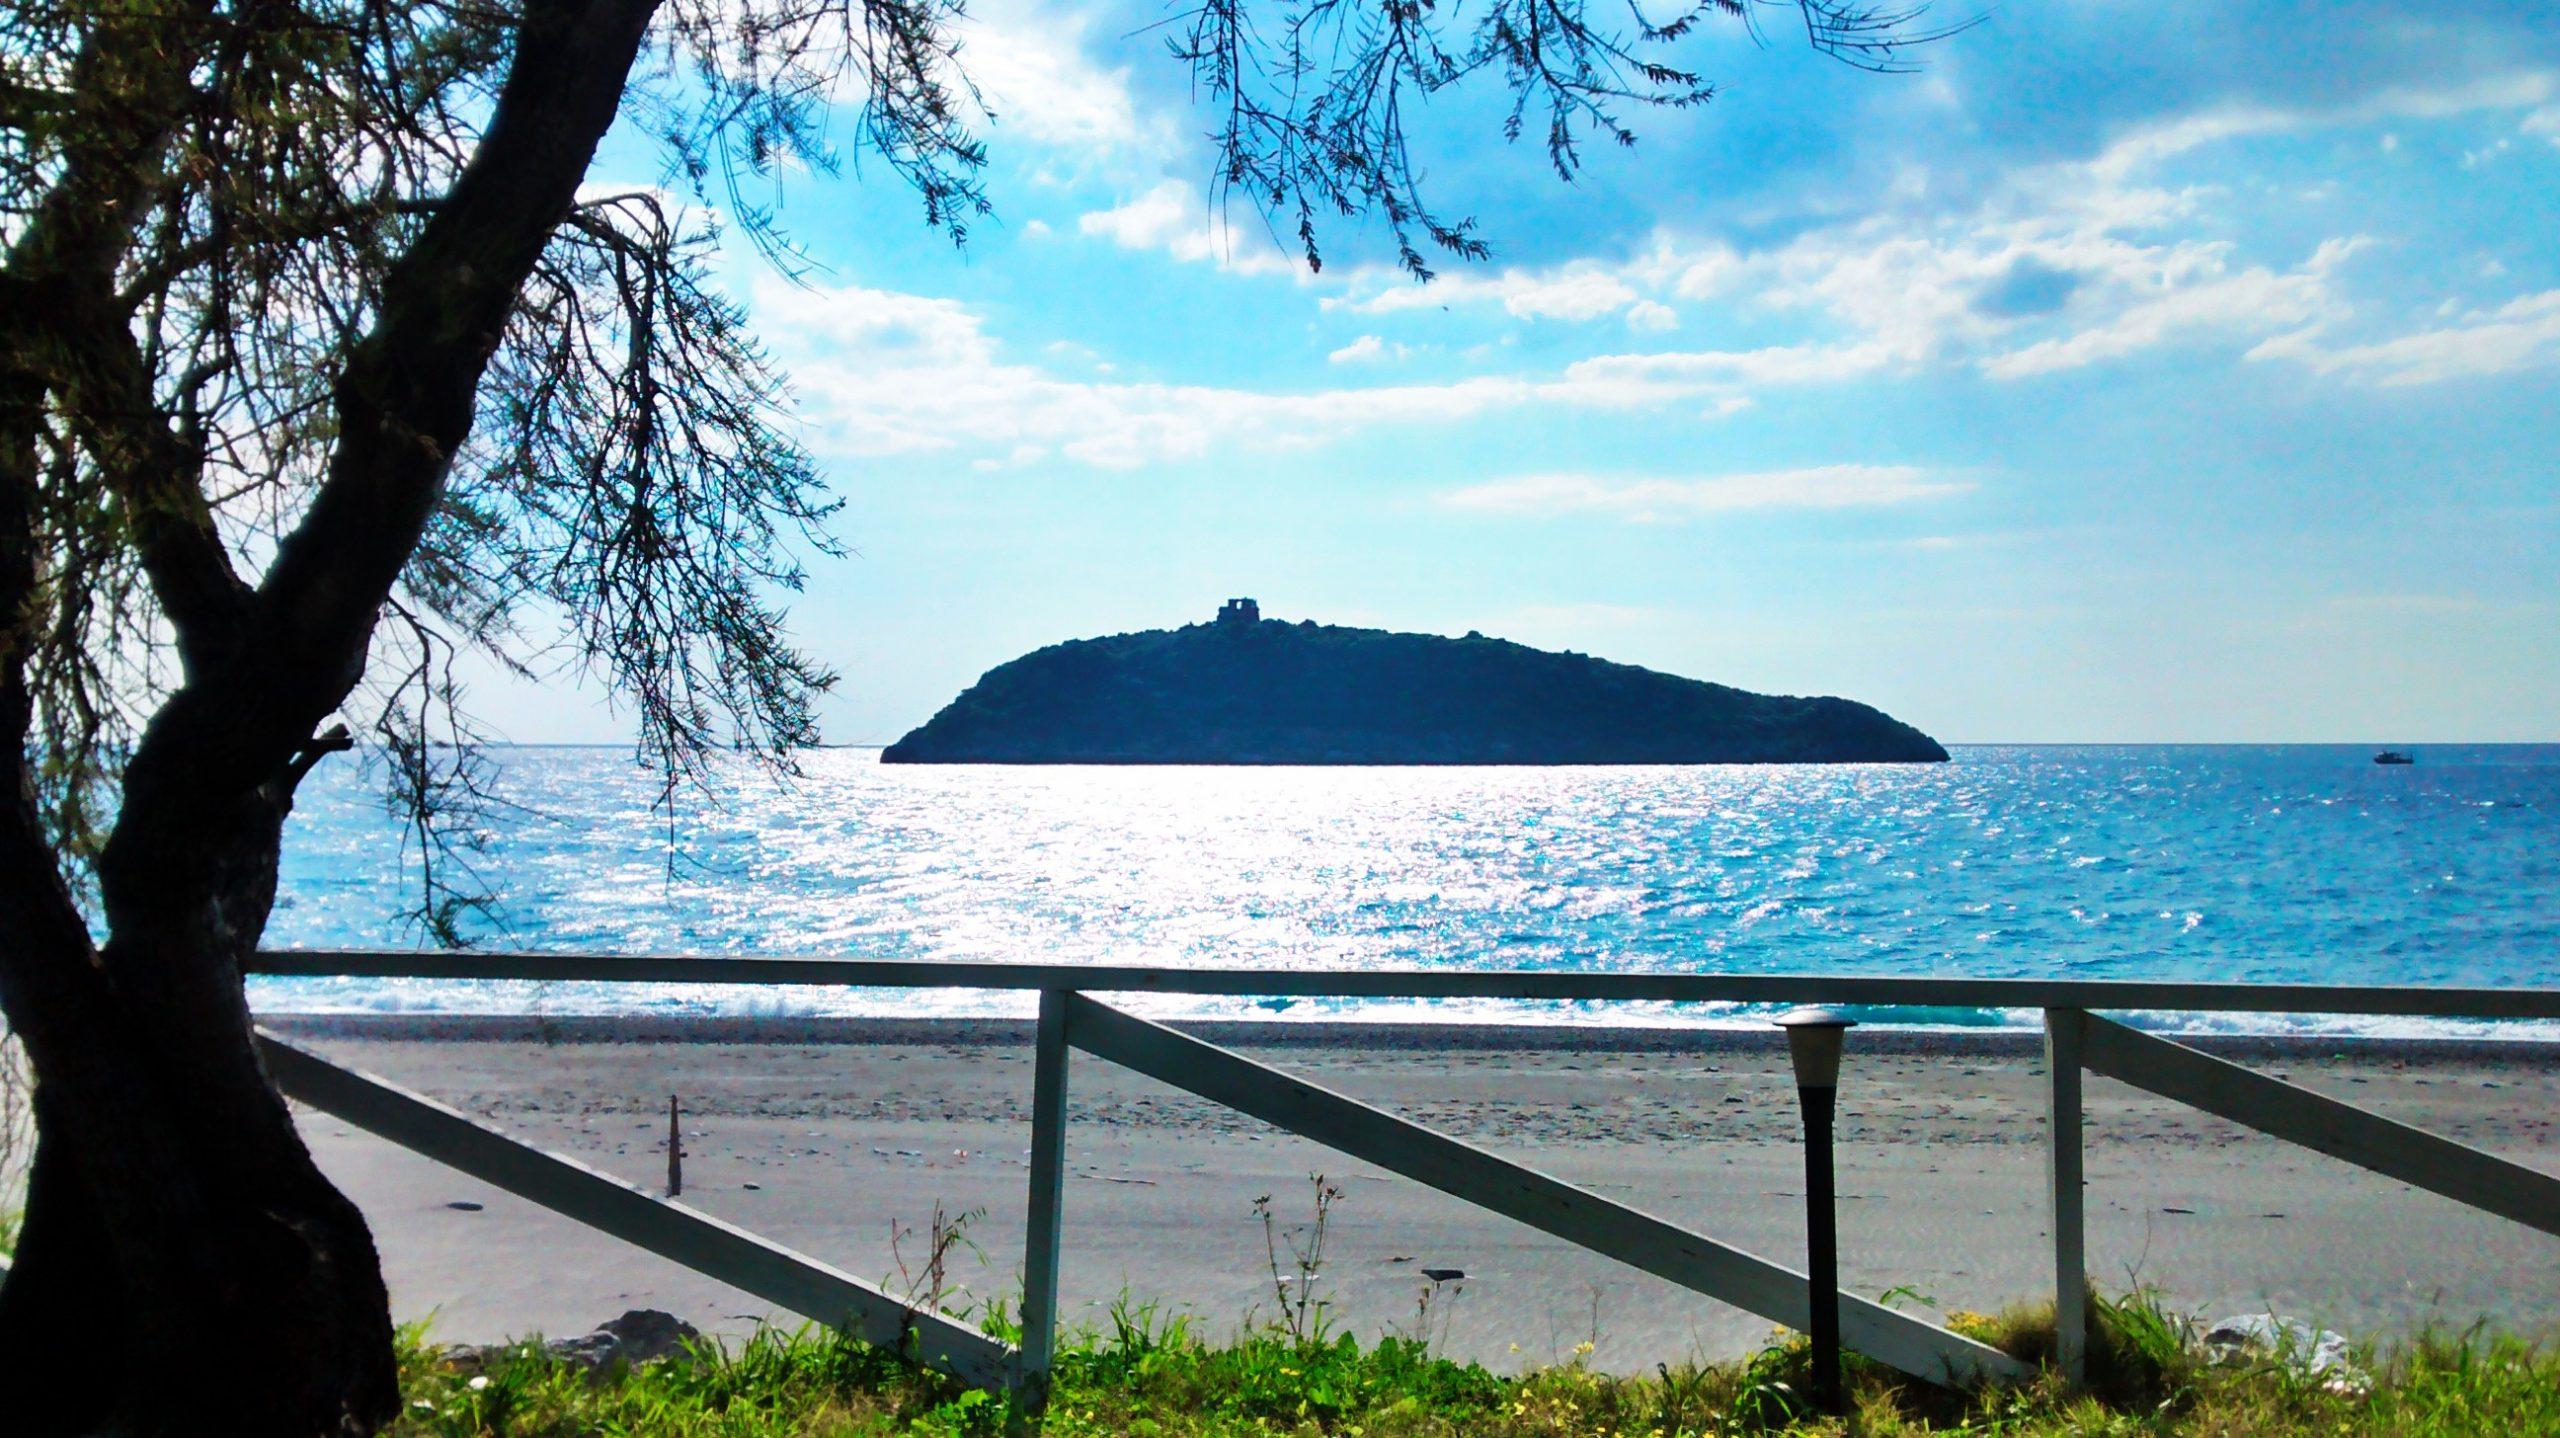 L'arcipelago Sagarote: una casa lenta